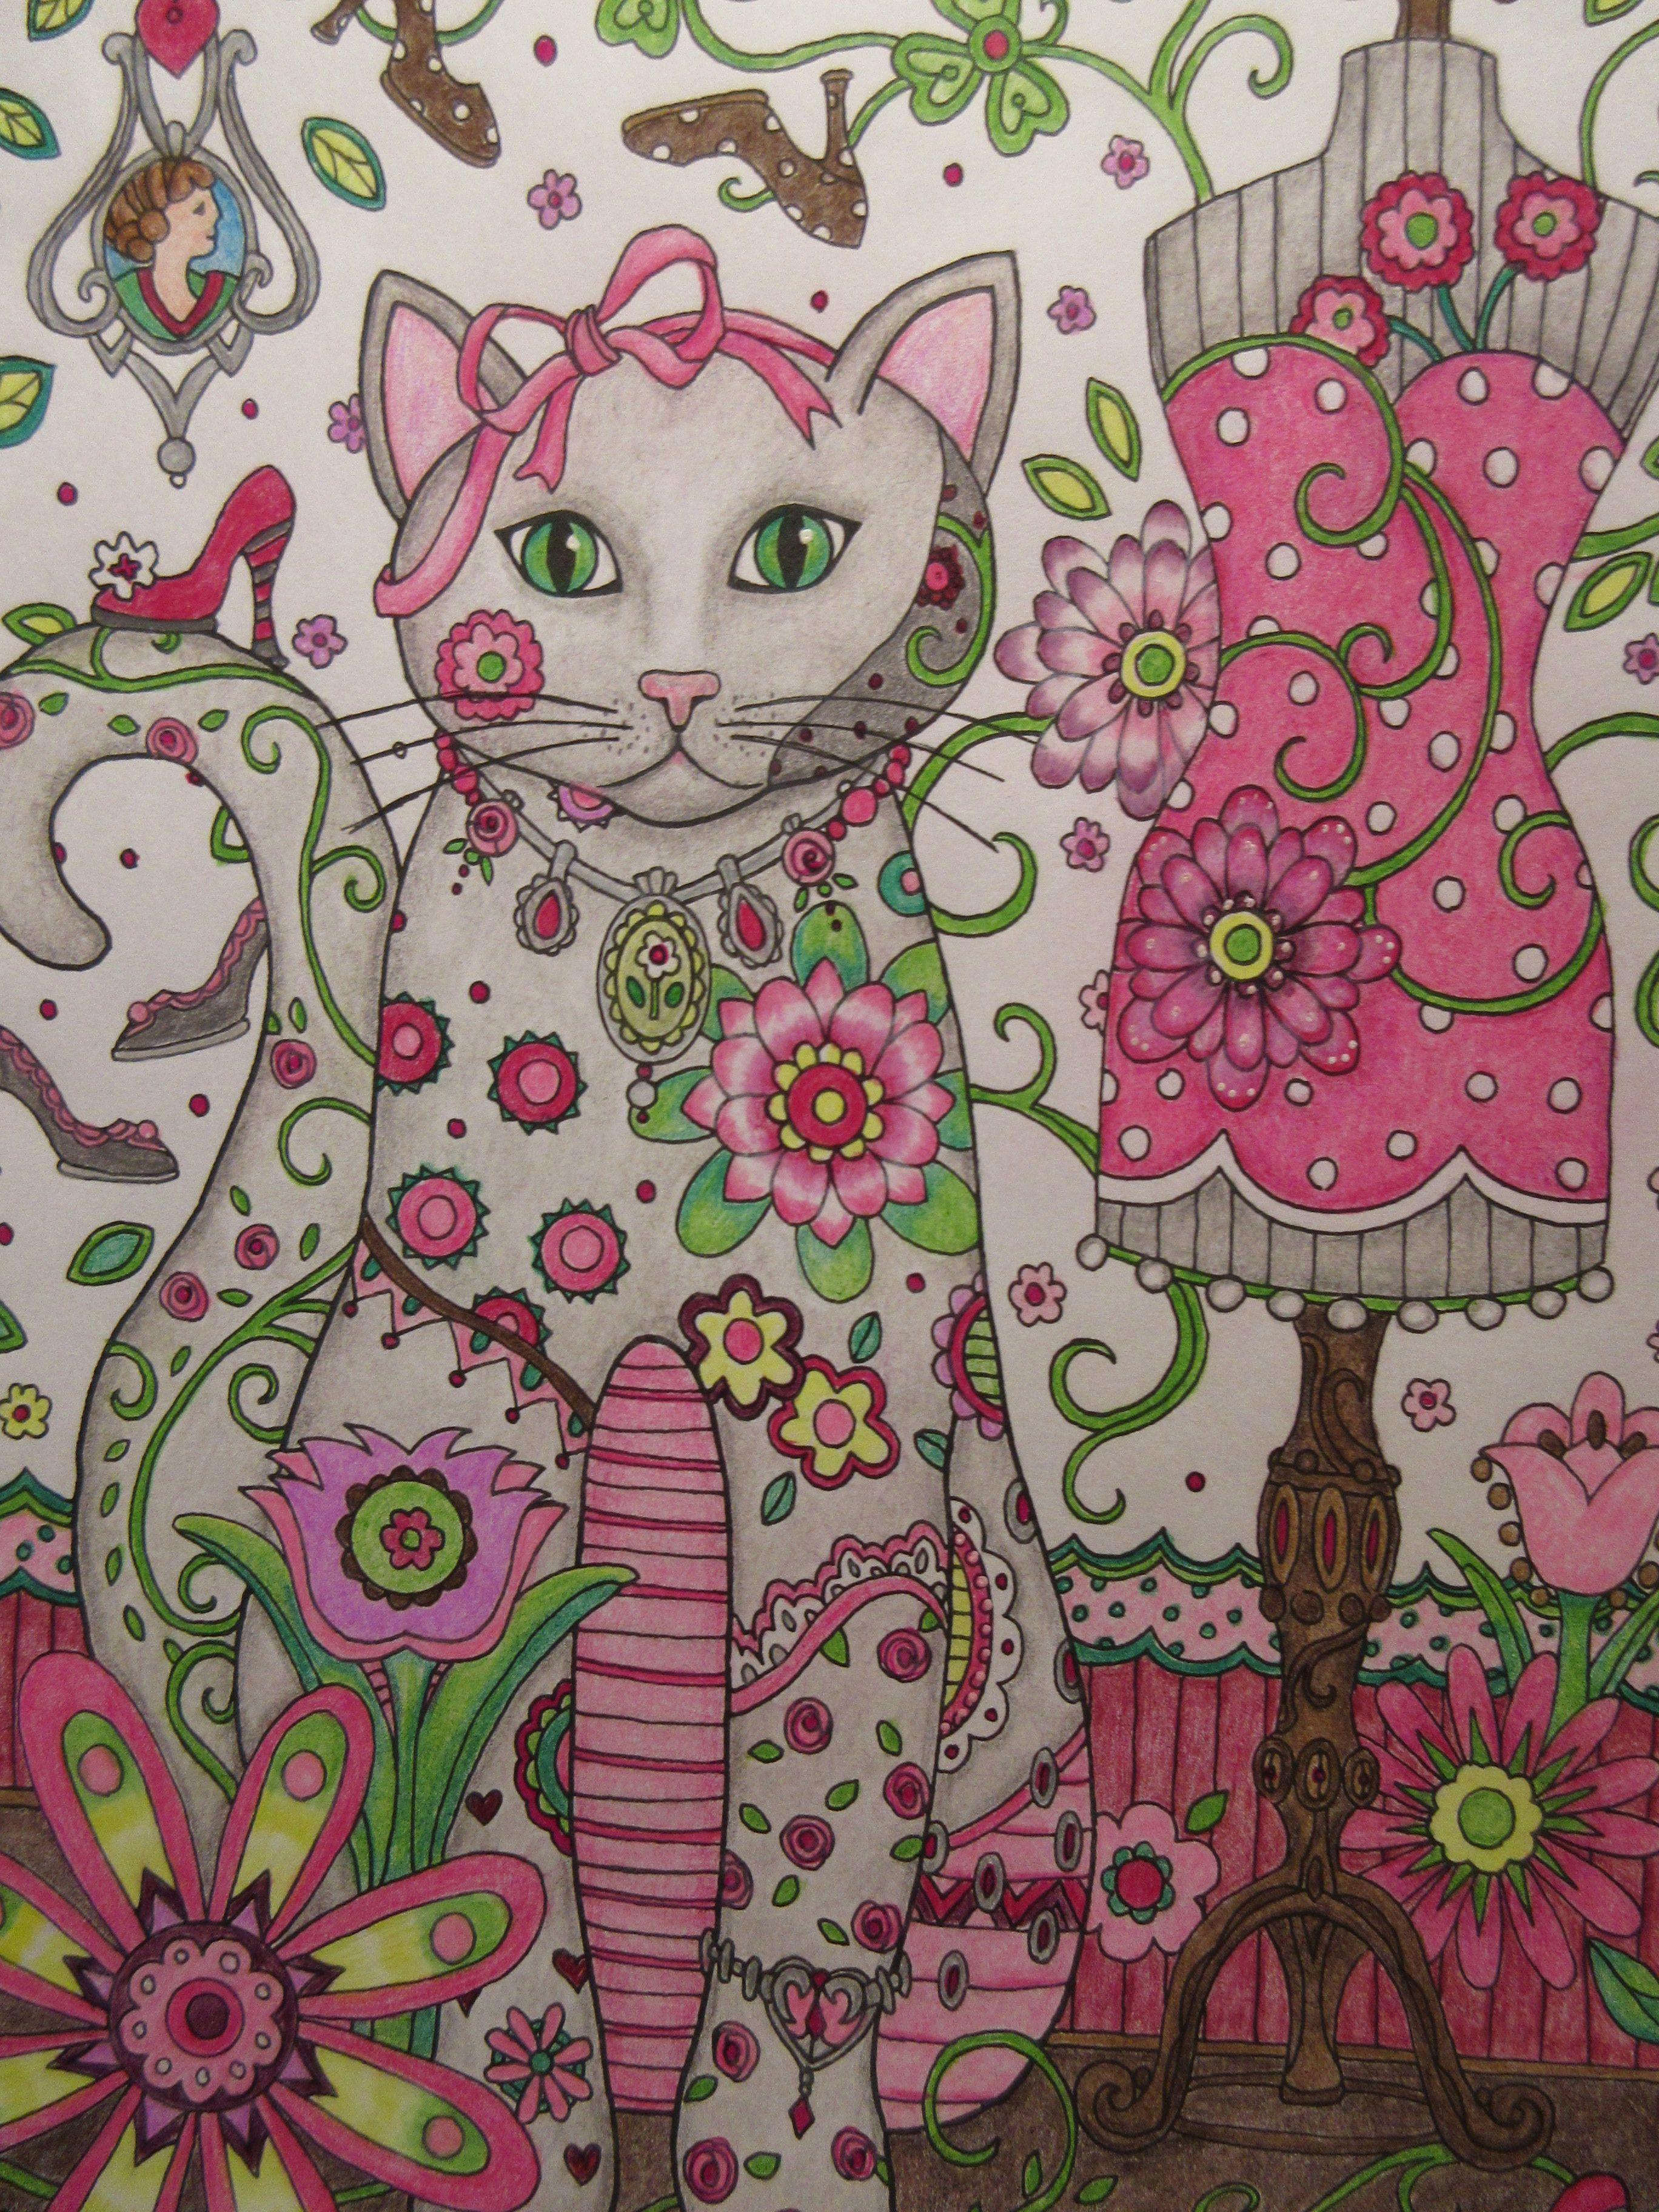 Creative cats by marjorie sarnat colored in prismacolors desenhos